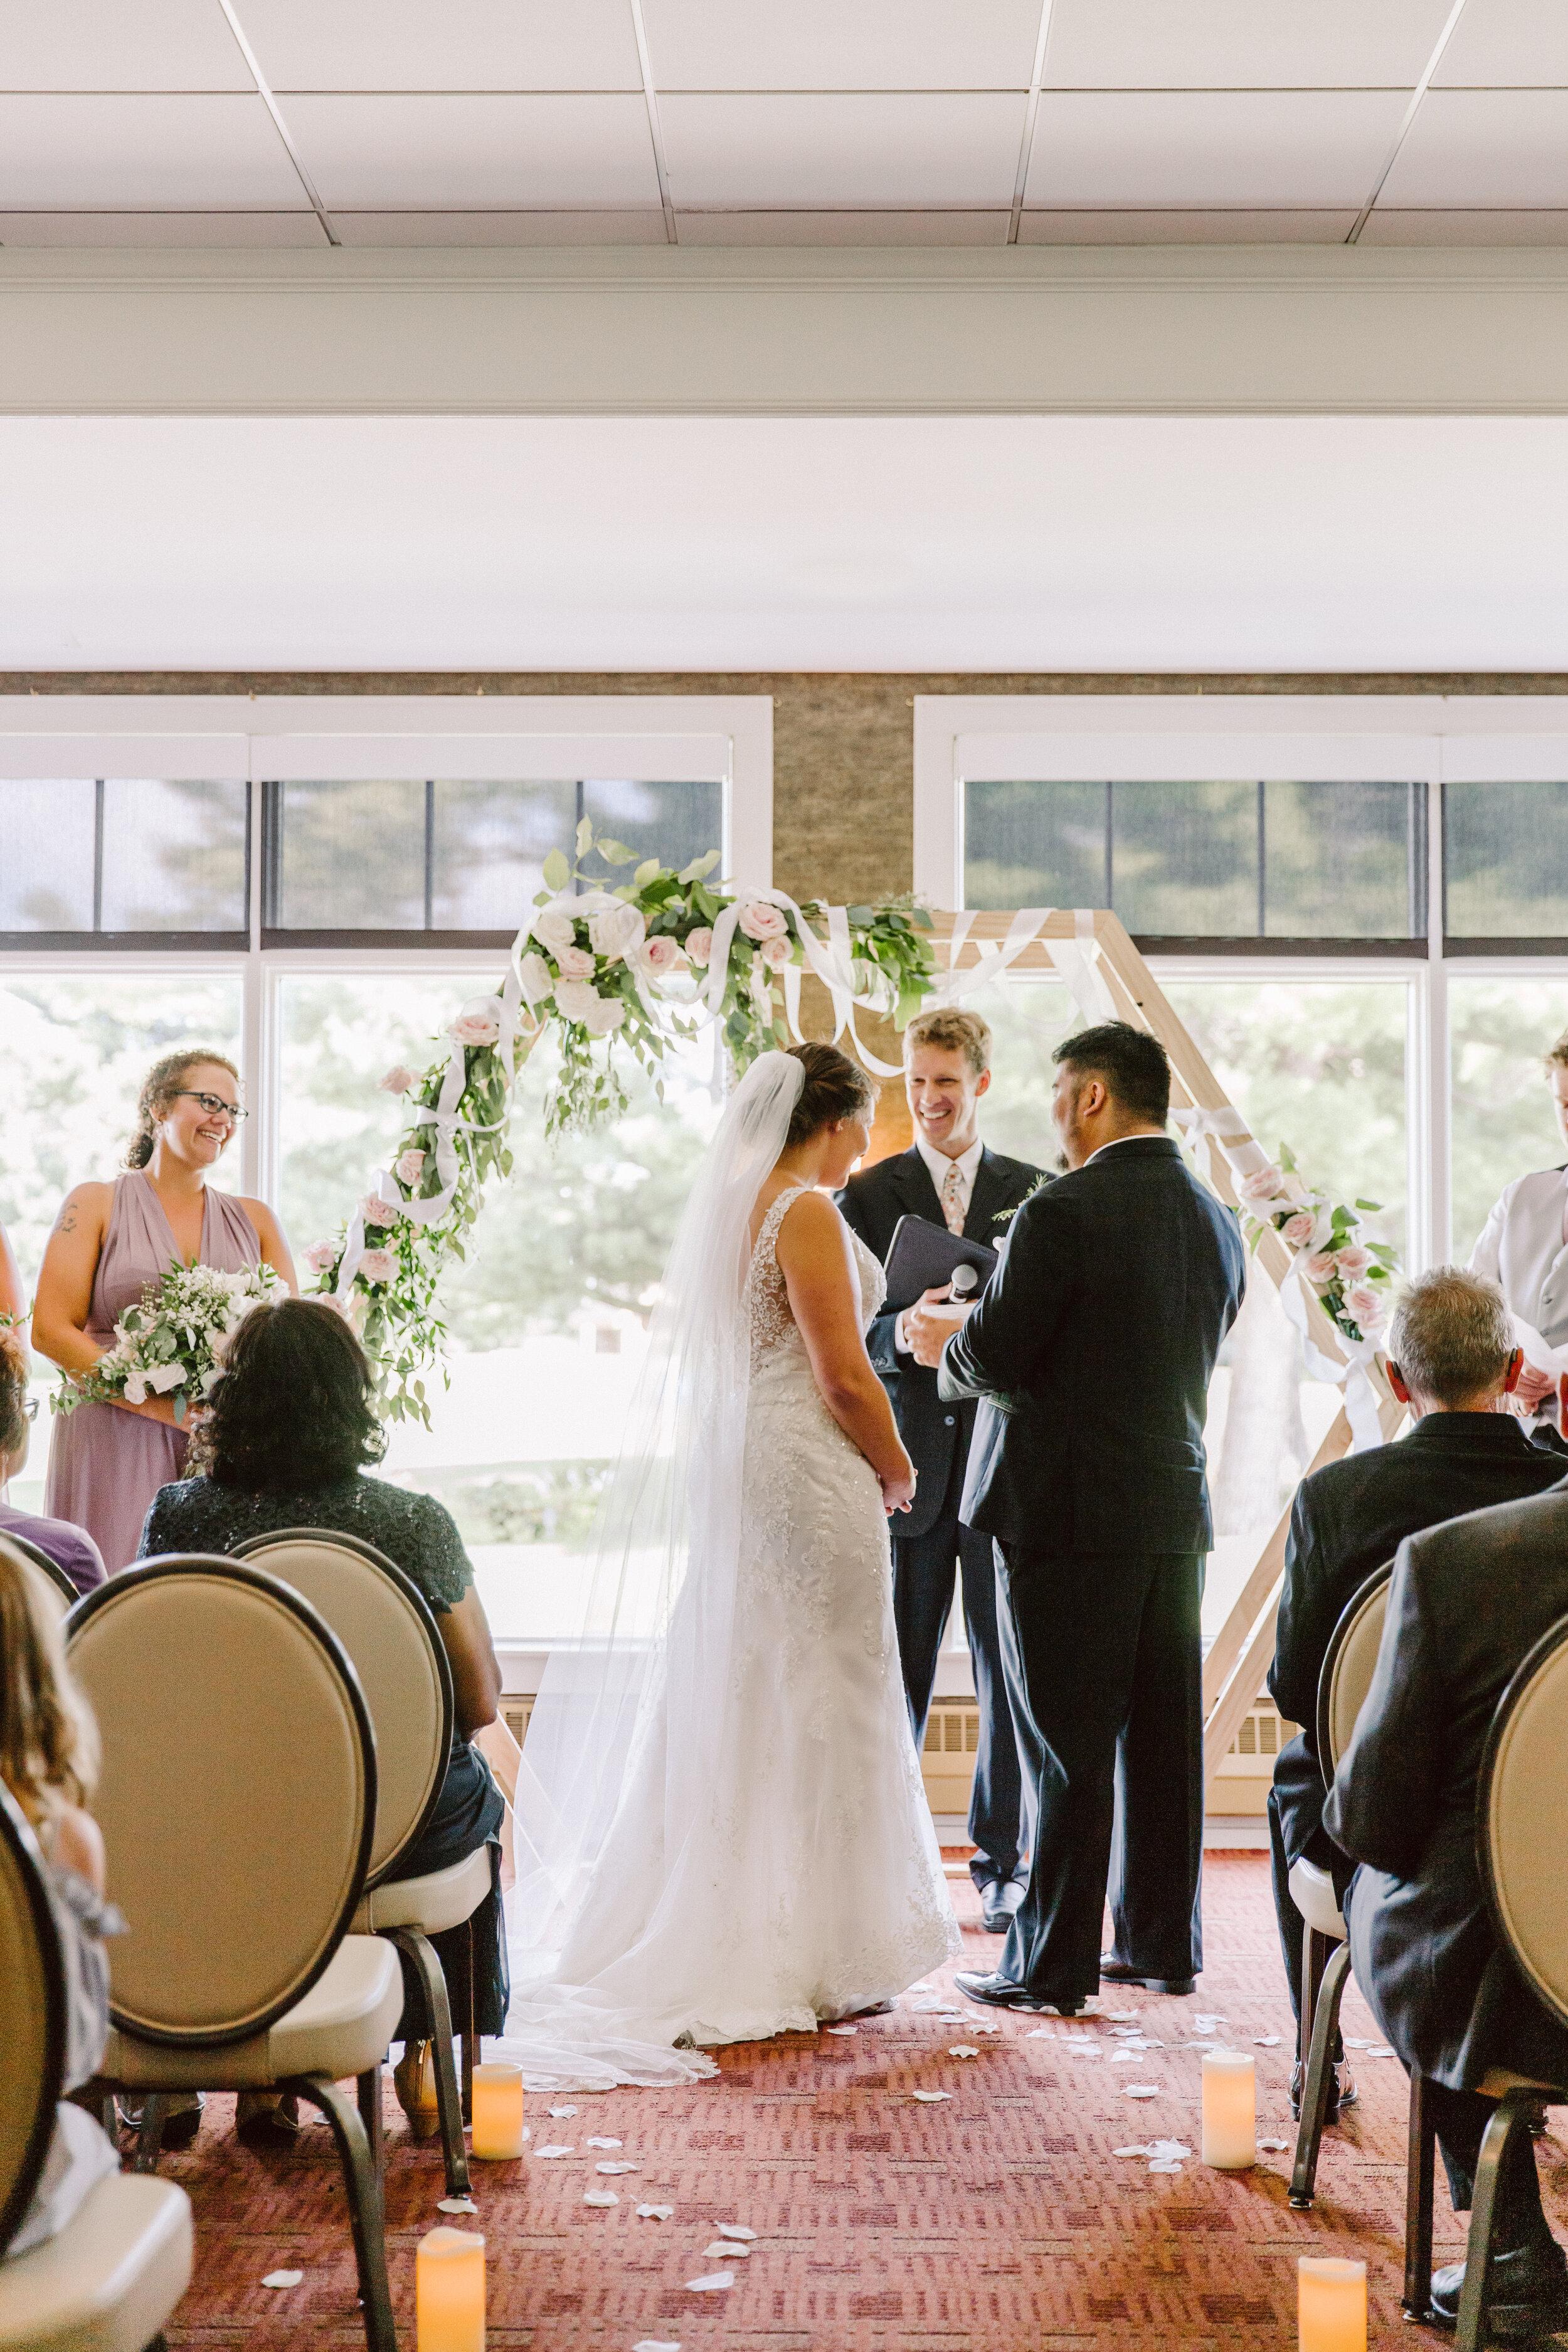 S&B Wedding - Ceremony-37.jpg